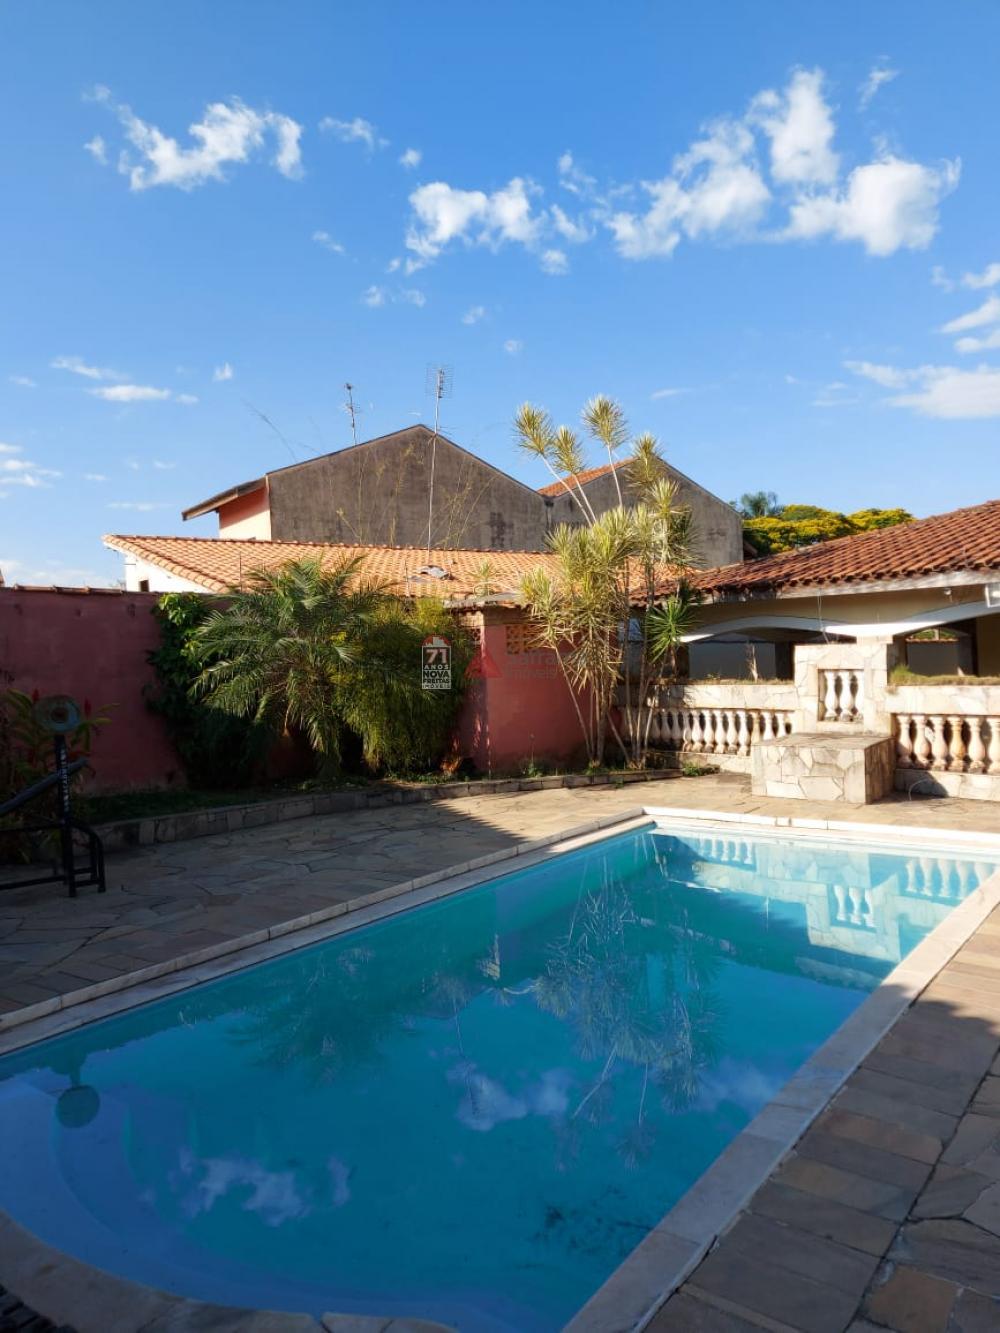 Comprar Casa / Padrão em Pindamonhangaba R$ 900.000,00 - Foto 16